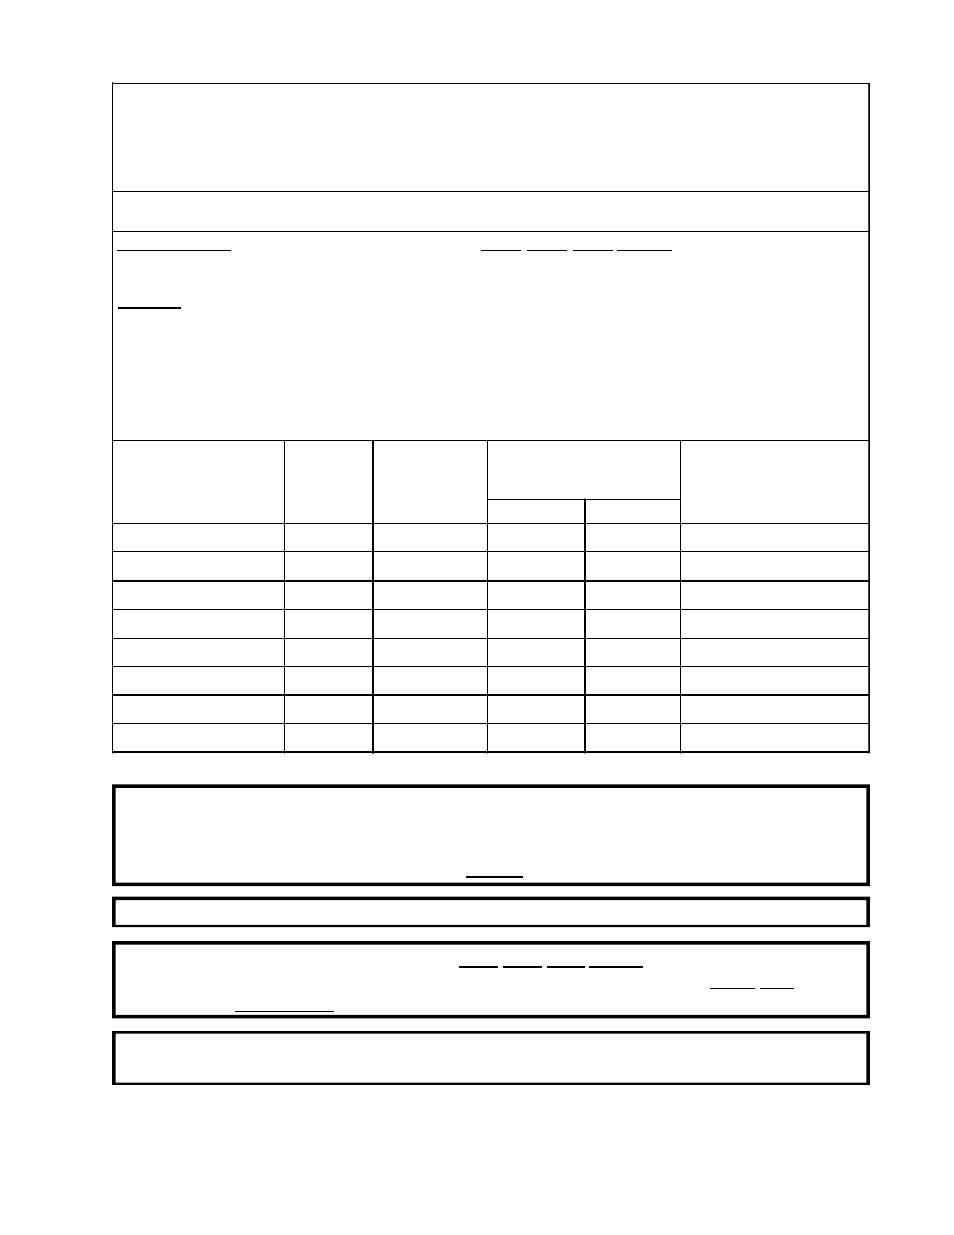 Adg-25, Gas) ads-25, Steam ) | American Dryer Corp. AD-50V User ...